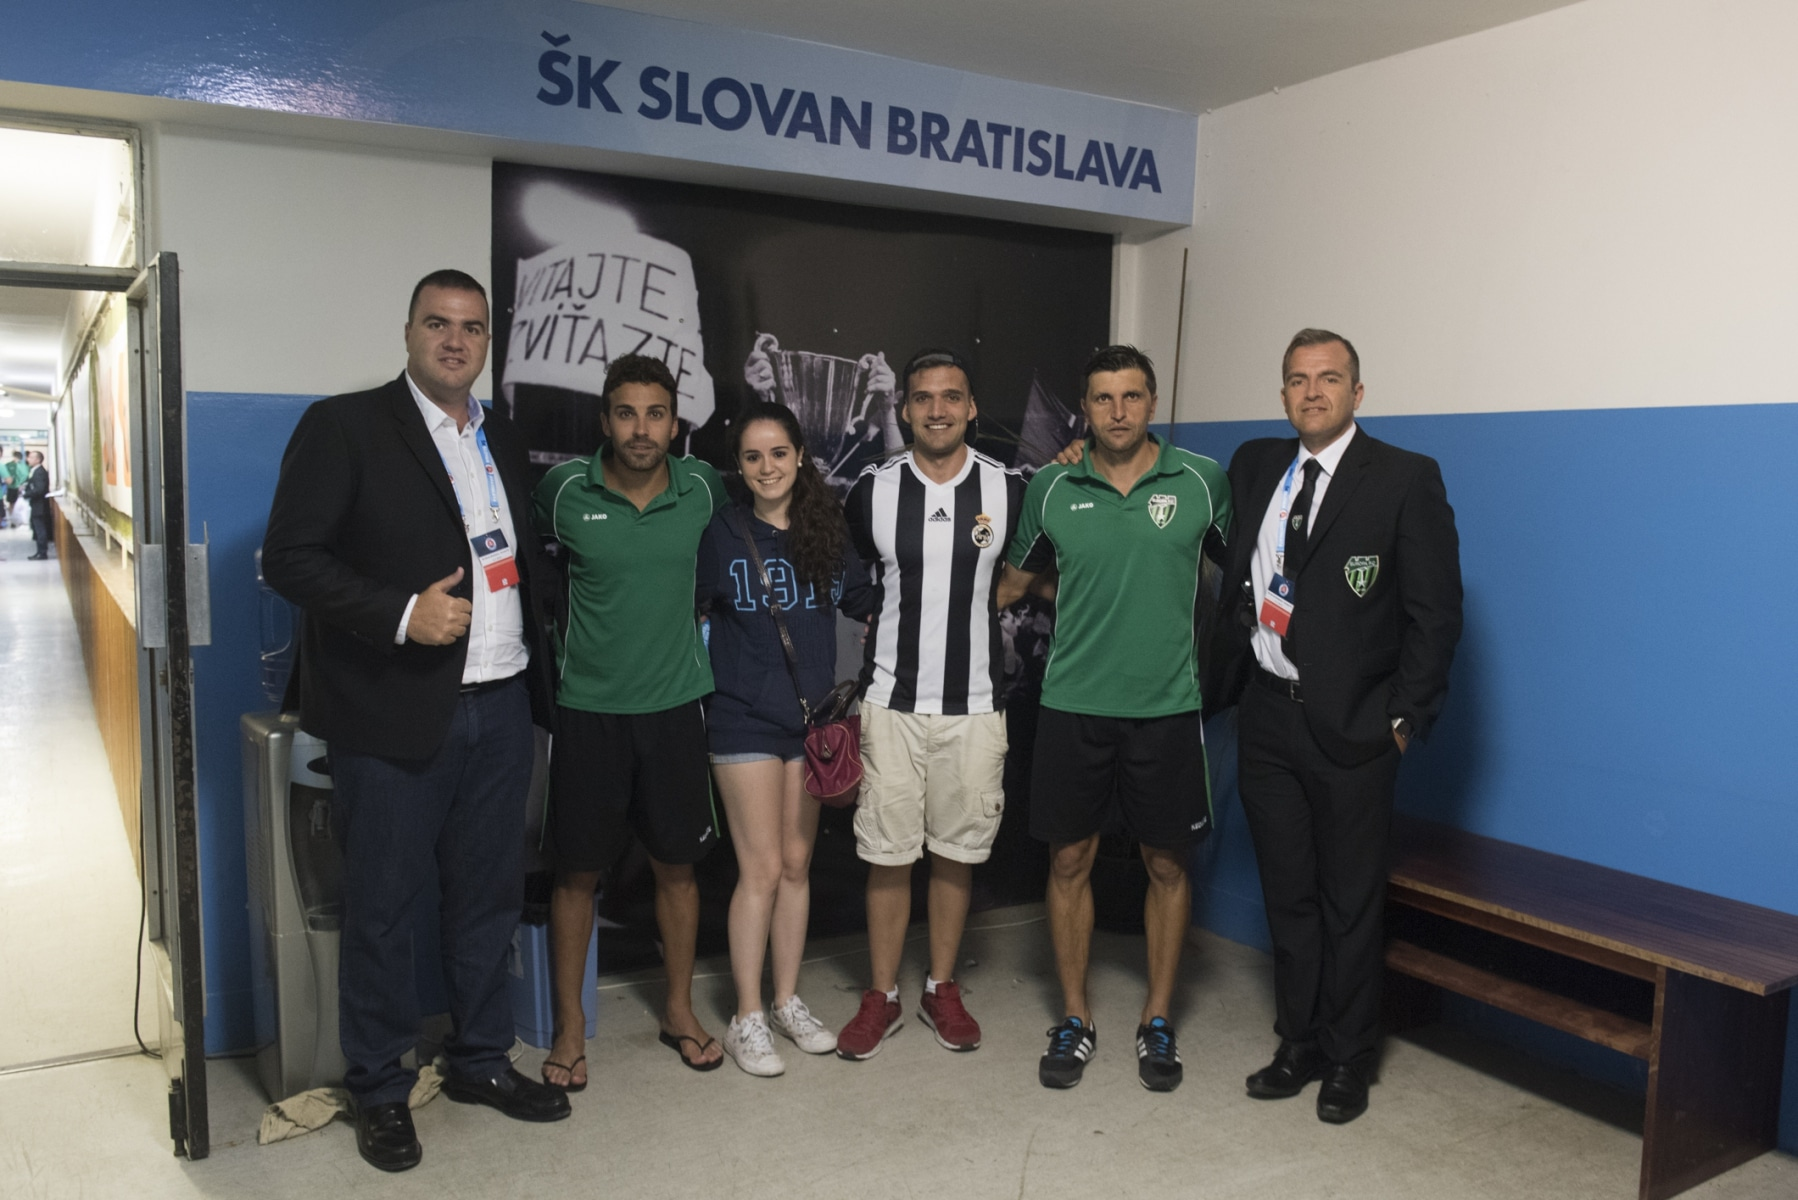 sk-slovan-bratislava-europa-fc-gibraltar-09072015-14_18949660573_o